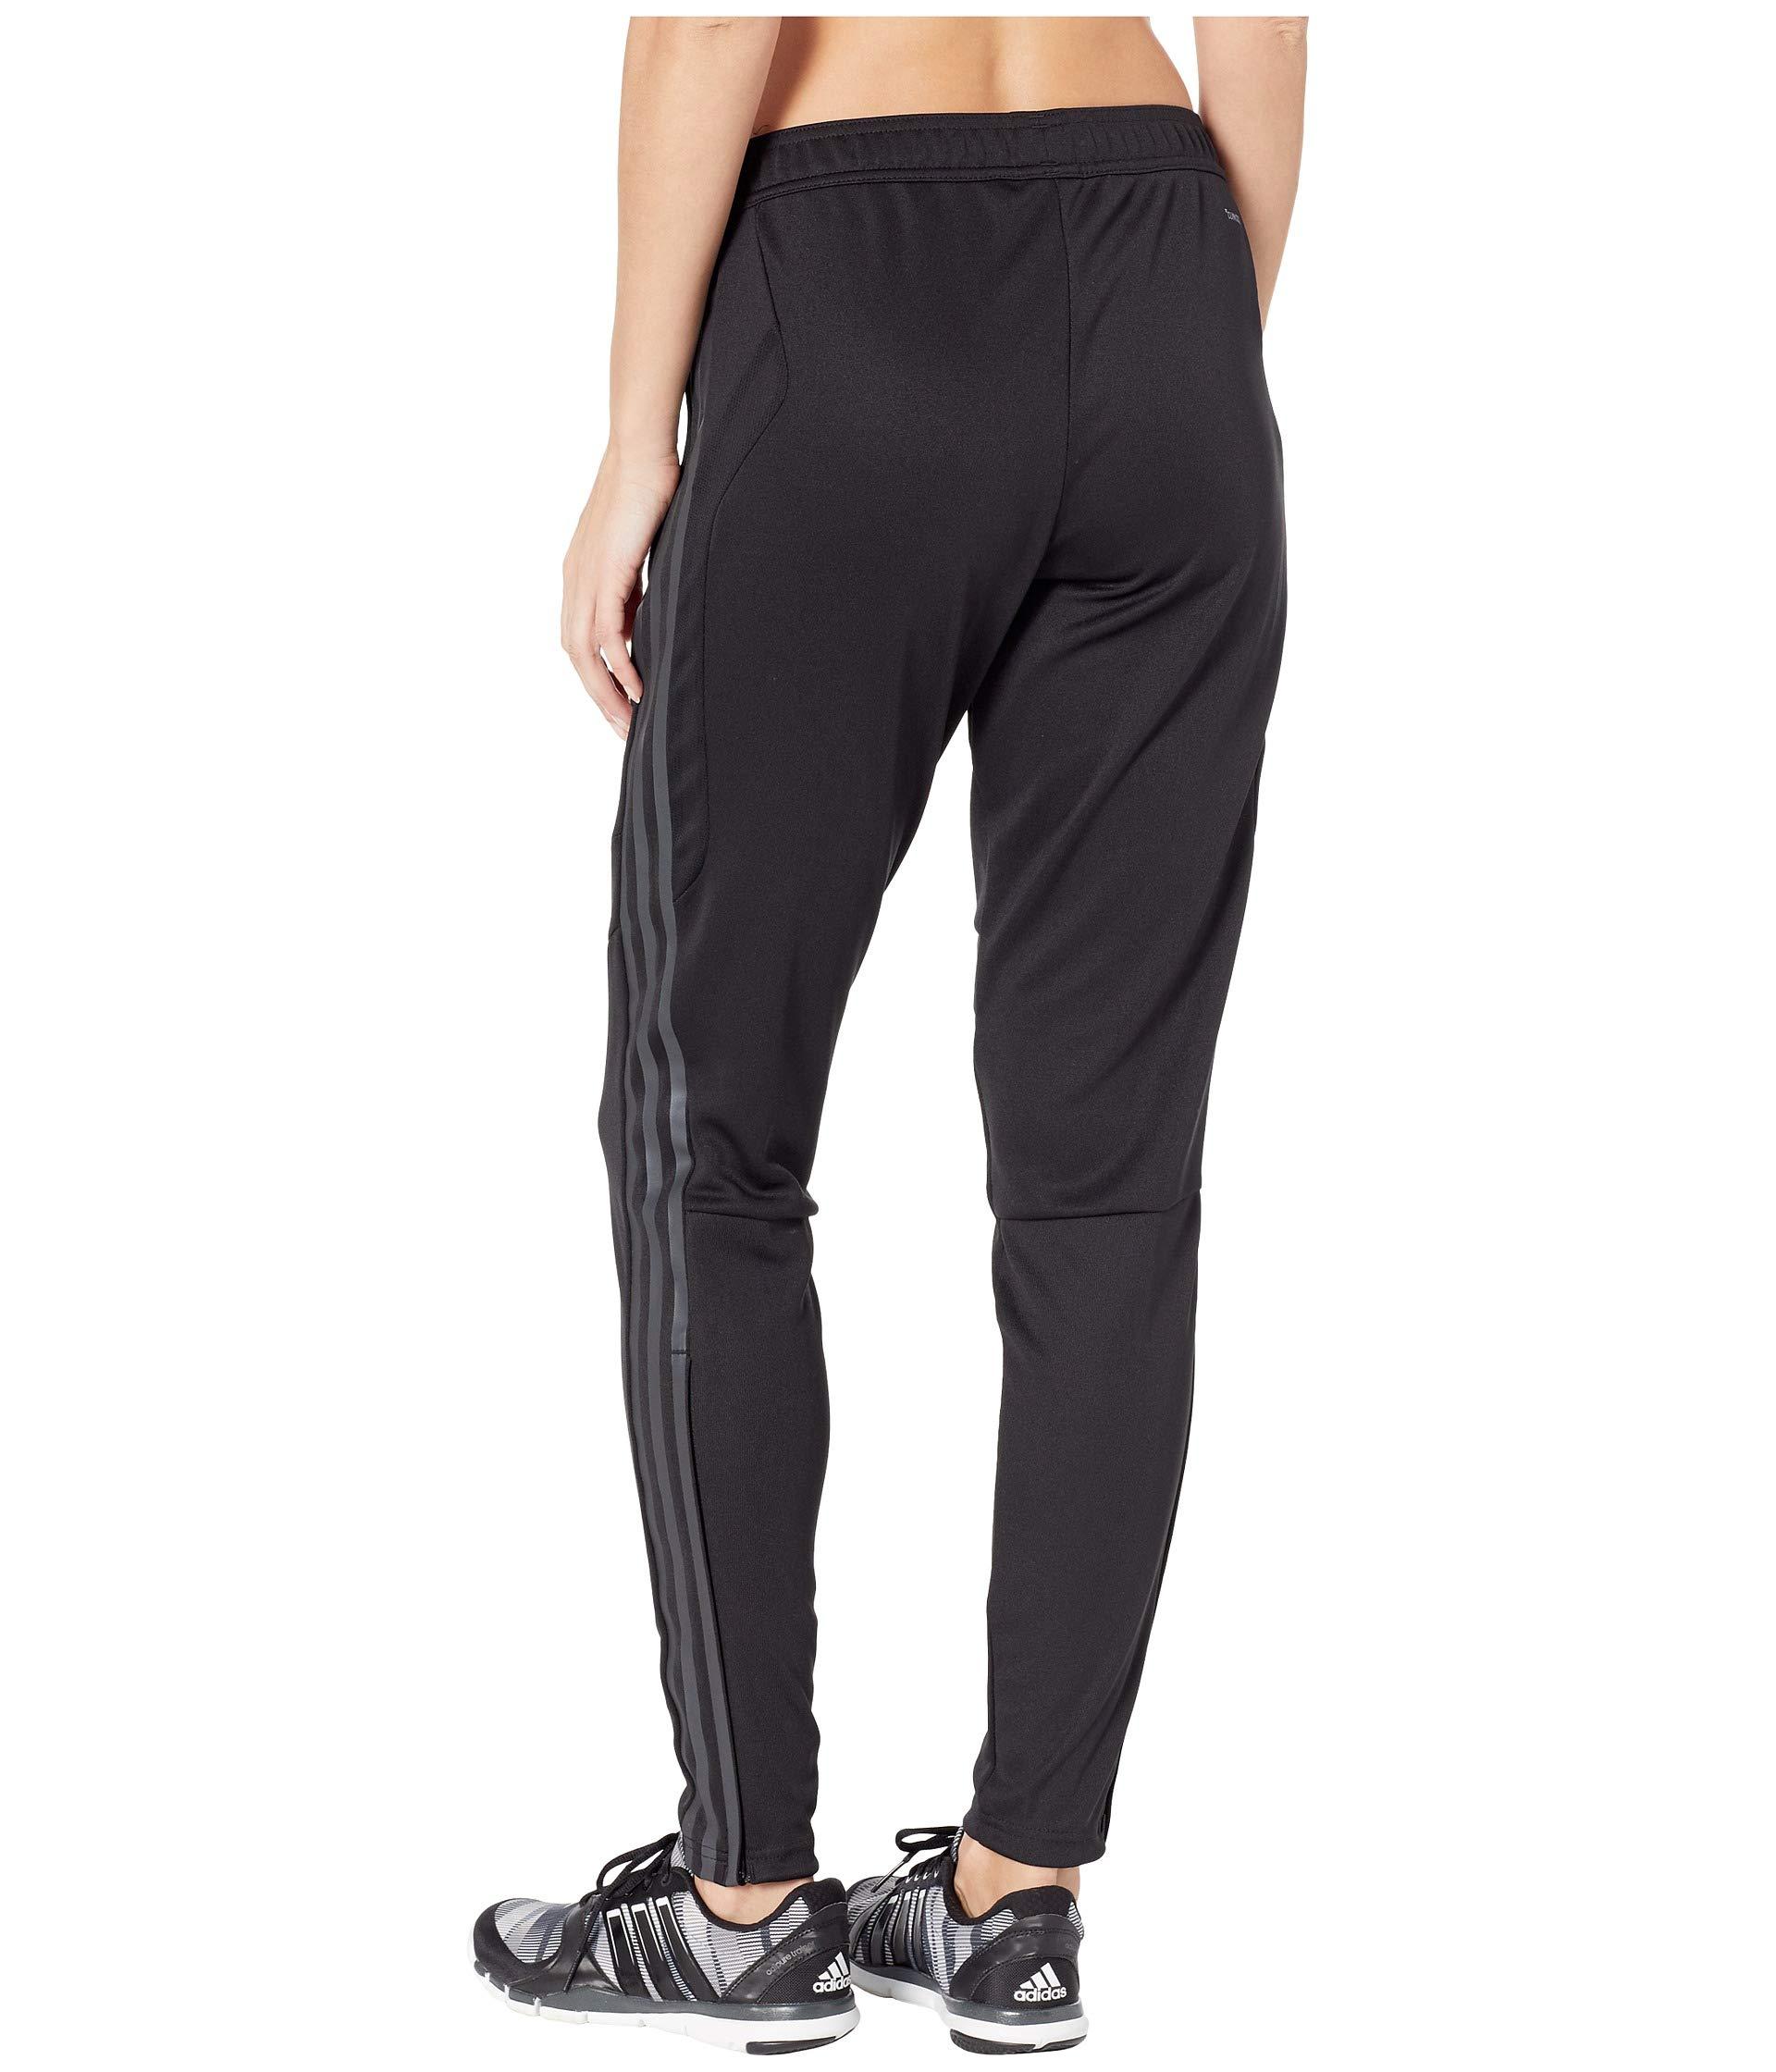 adidas Women's Soccer Tiro 19 Training Pant, XX-Small by adidas (Image #4)